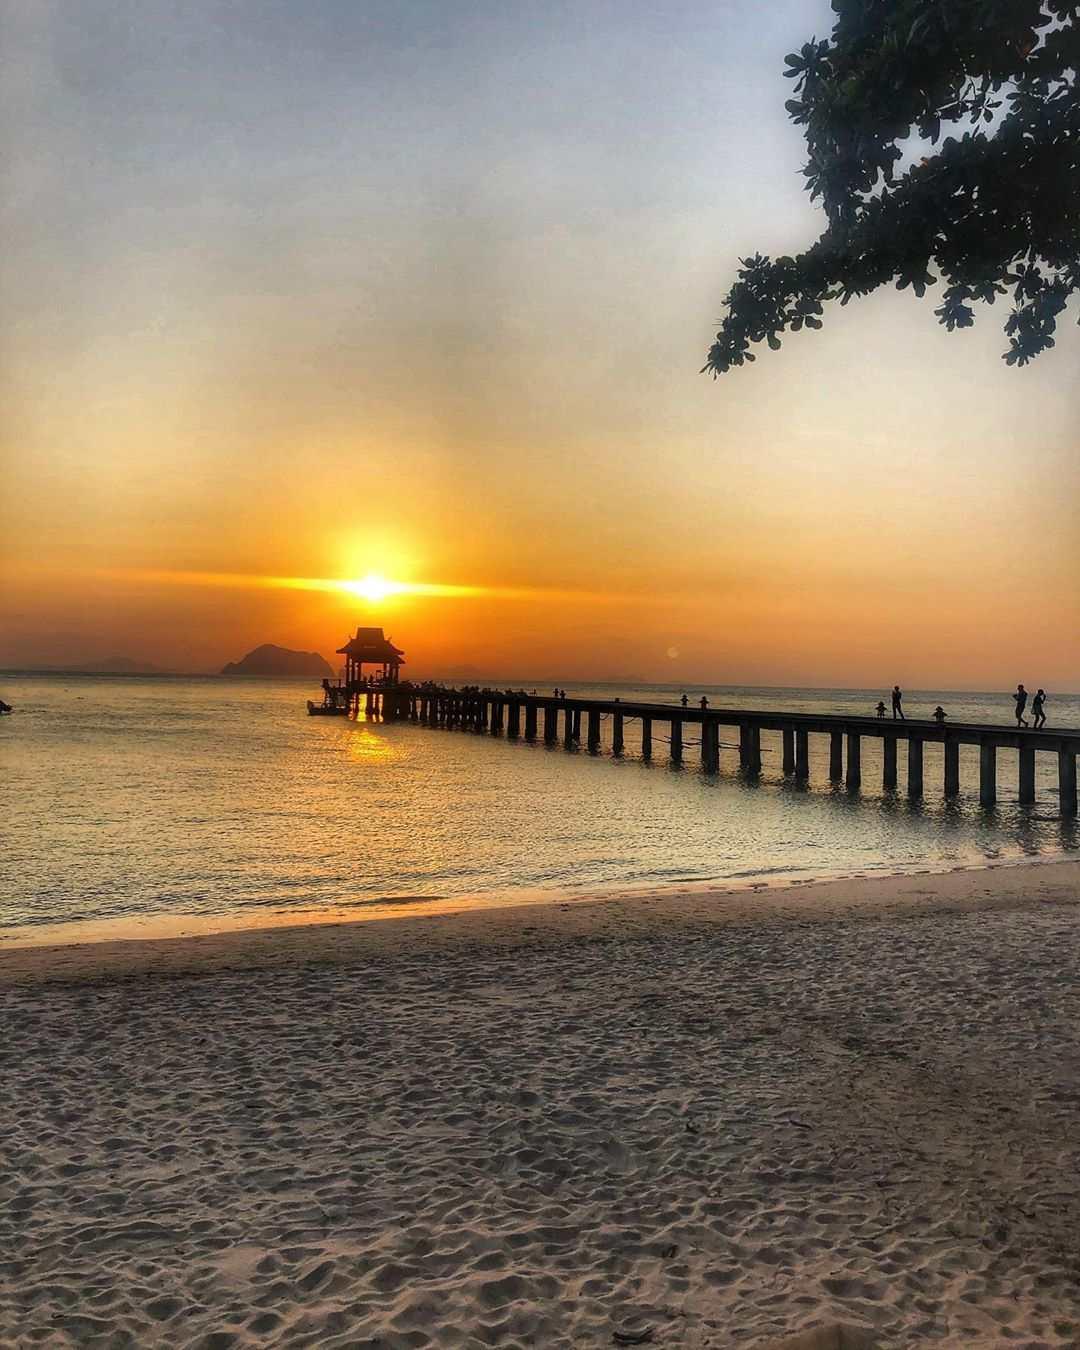 Jetinn Teppan Pier on Koh Yao Yai